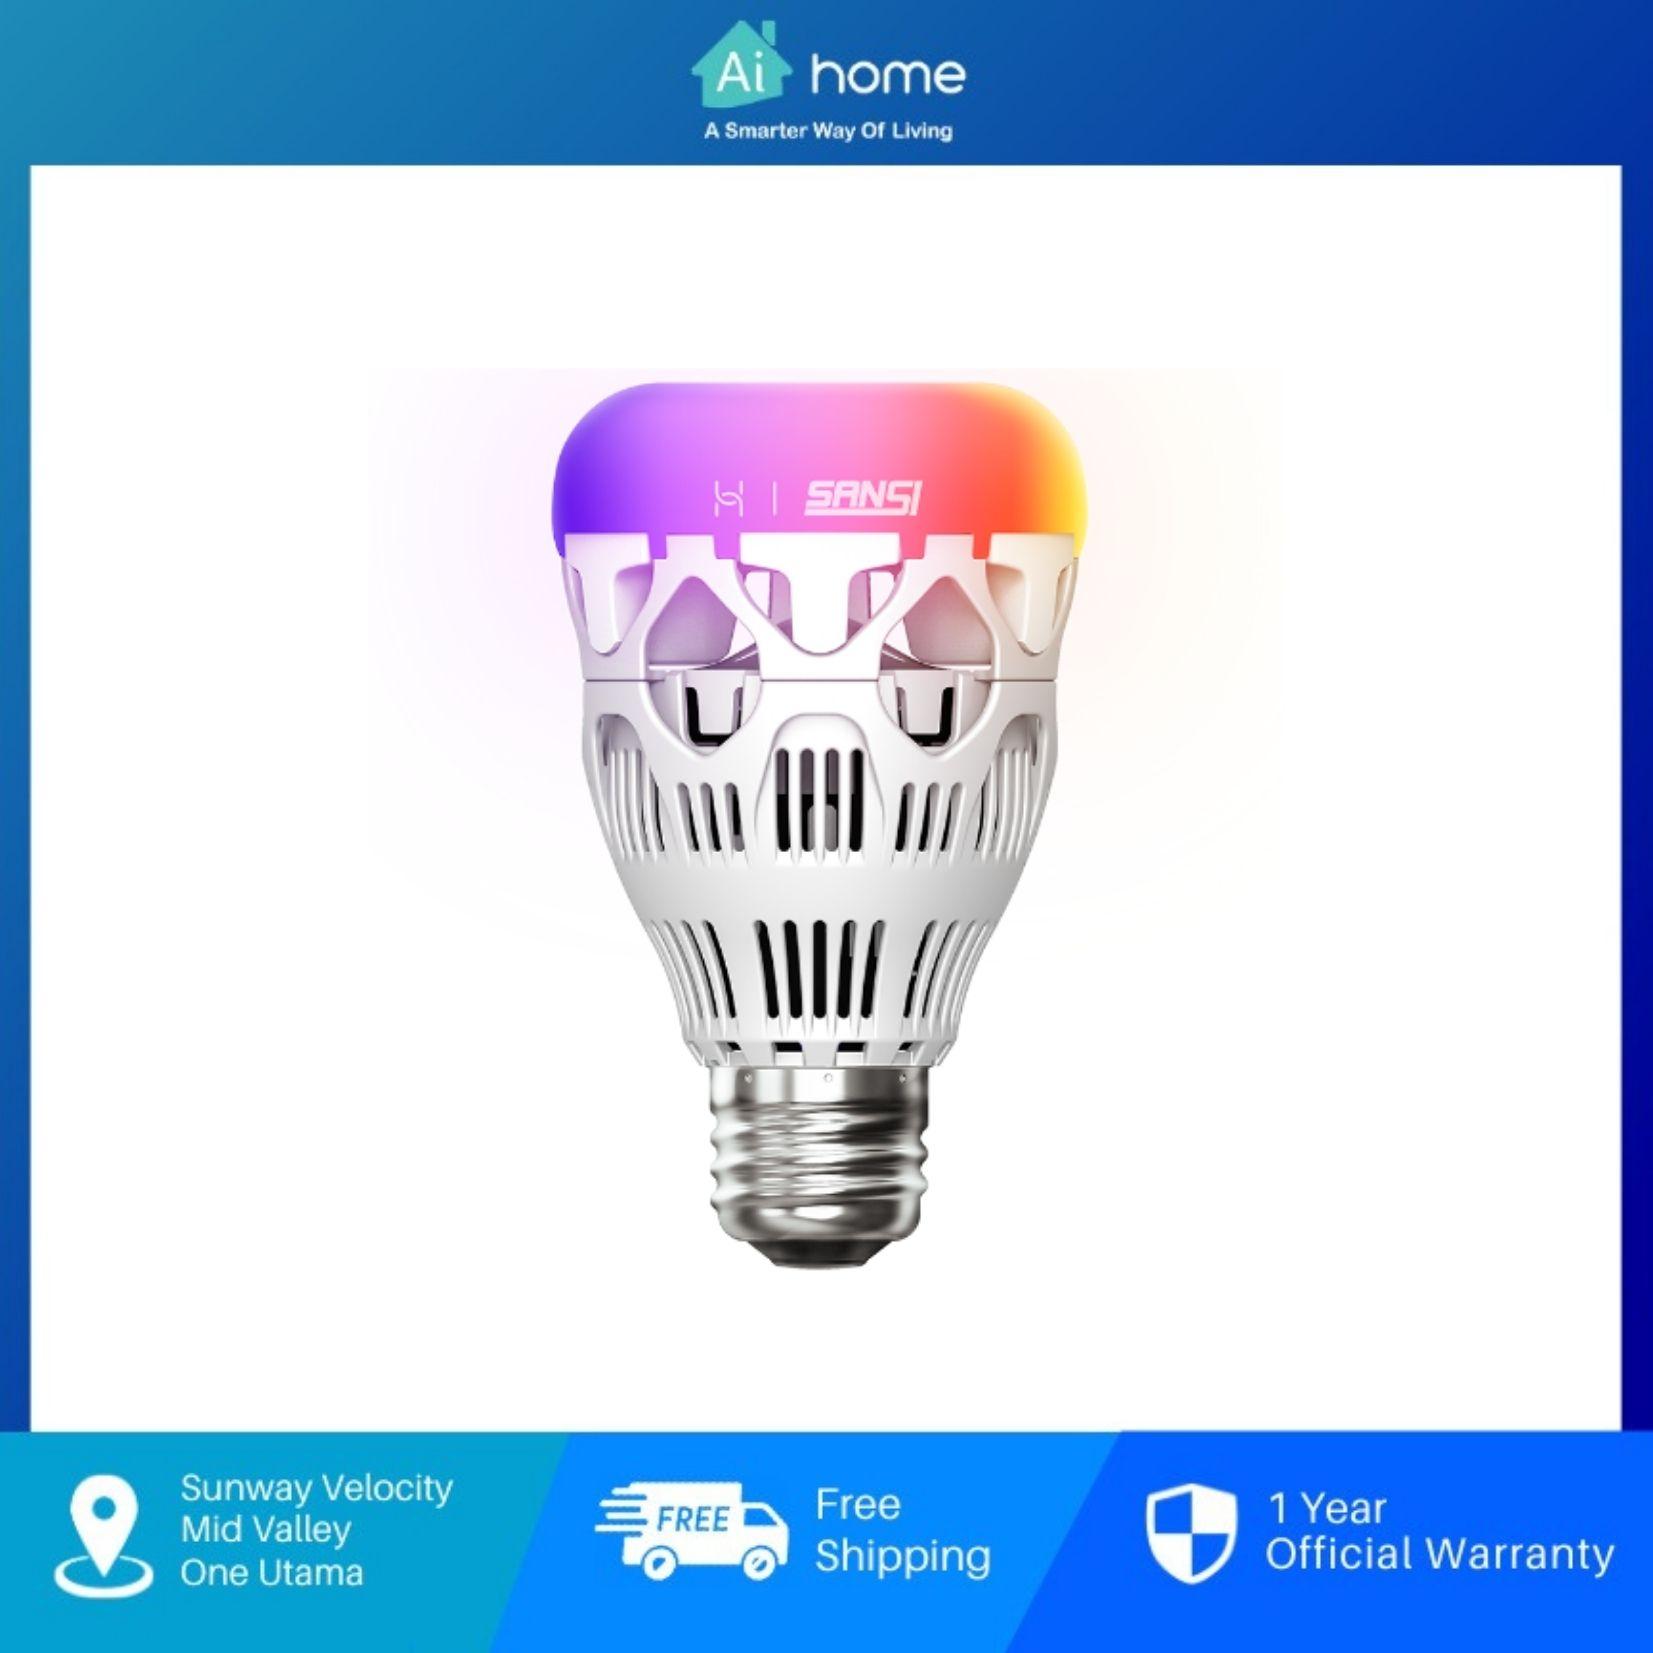 HUAWEI x SANSI Colorful Energy Saving Smart Light Bulb - CN Version   10W   Intelligent LED Full Color Bulb [ Aihome ]